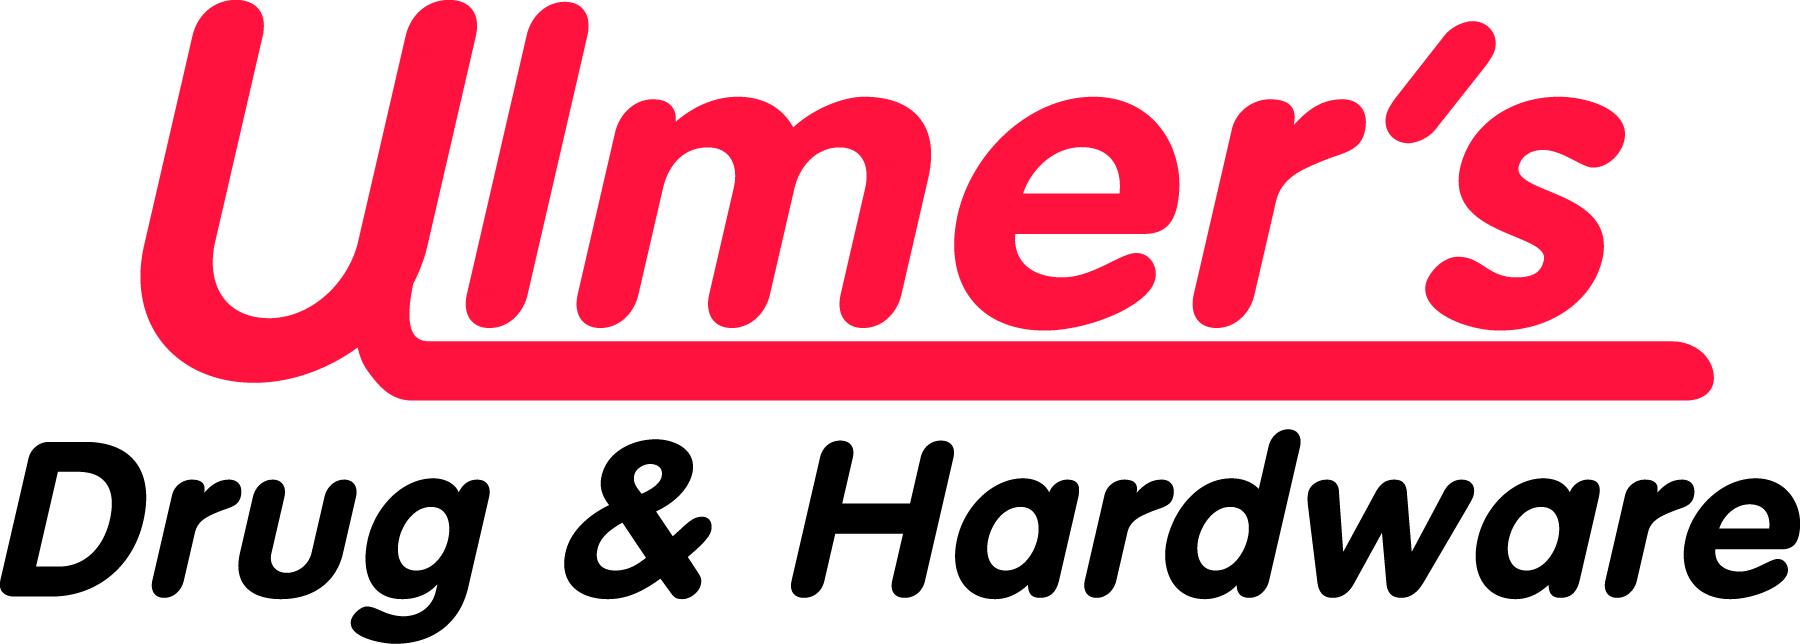 Ulmer's Drug & Hardware